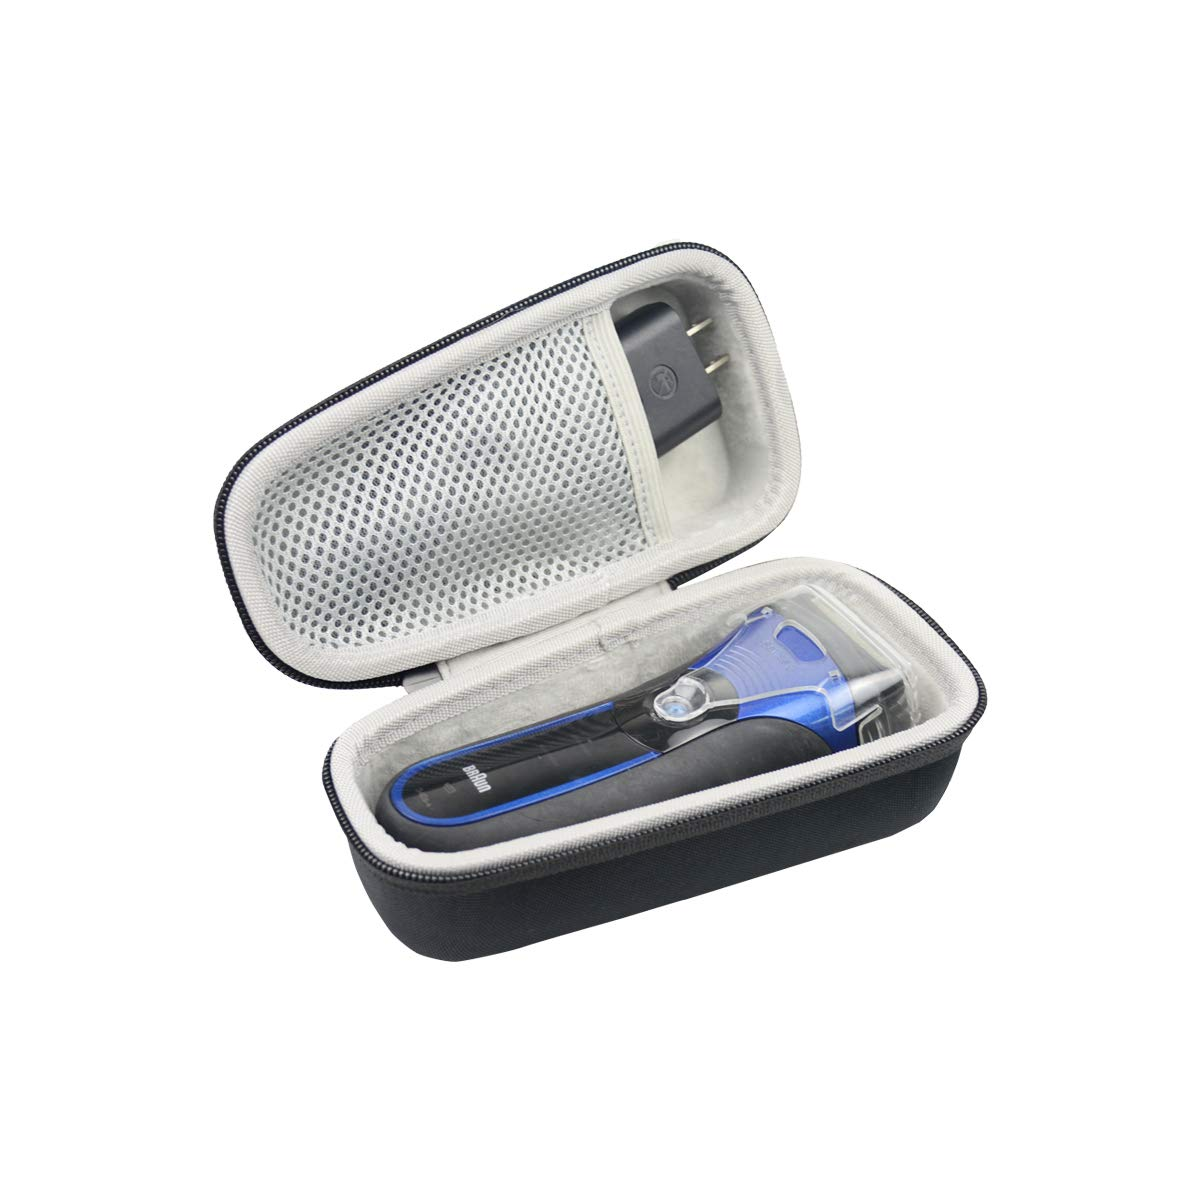 para Braun Series 3 ProSkin Afeitadora eléctrica inalámbrica y ...